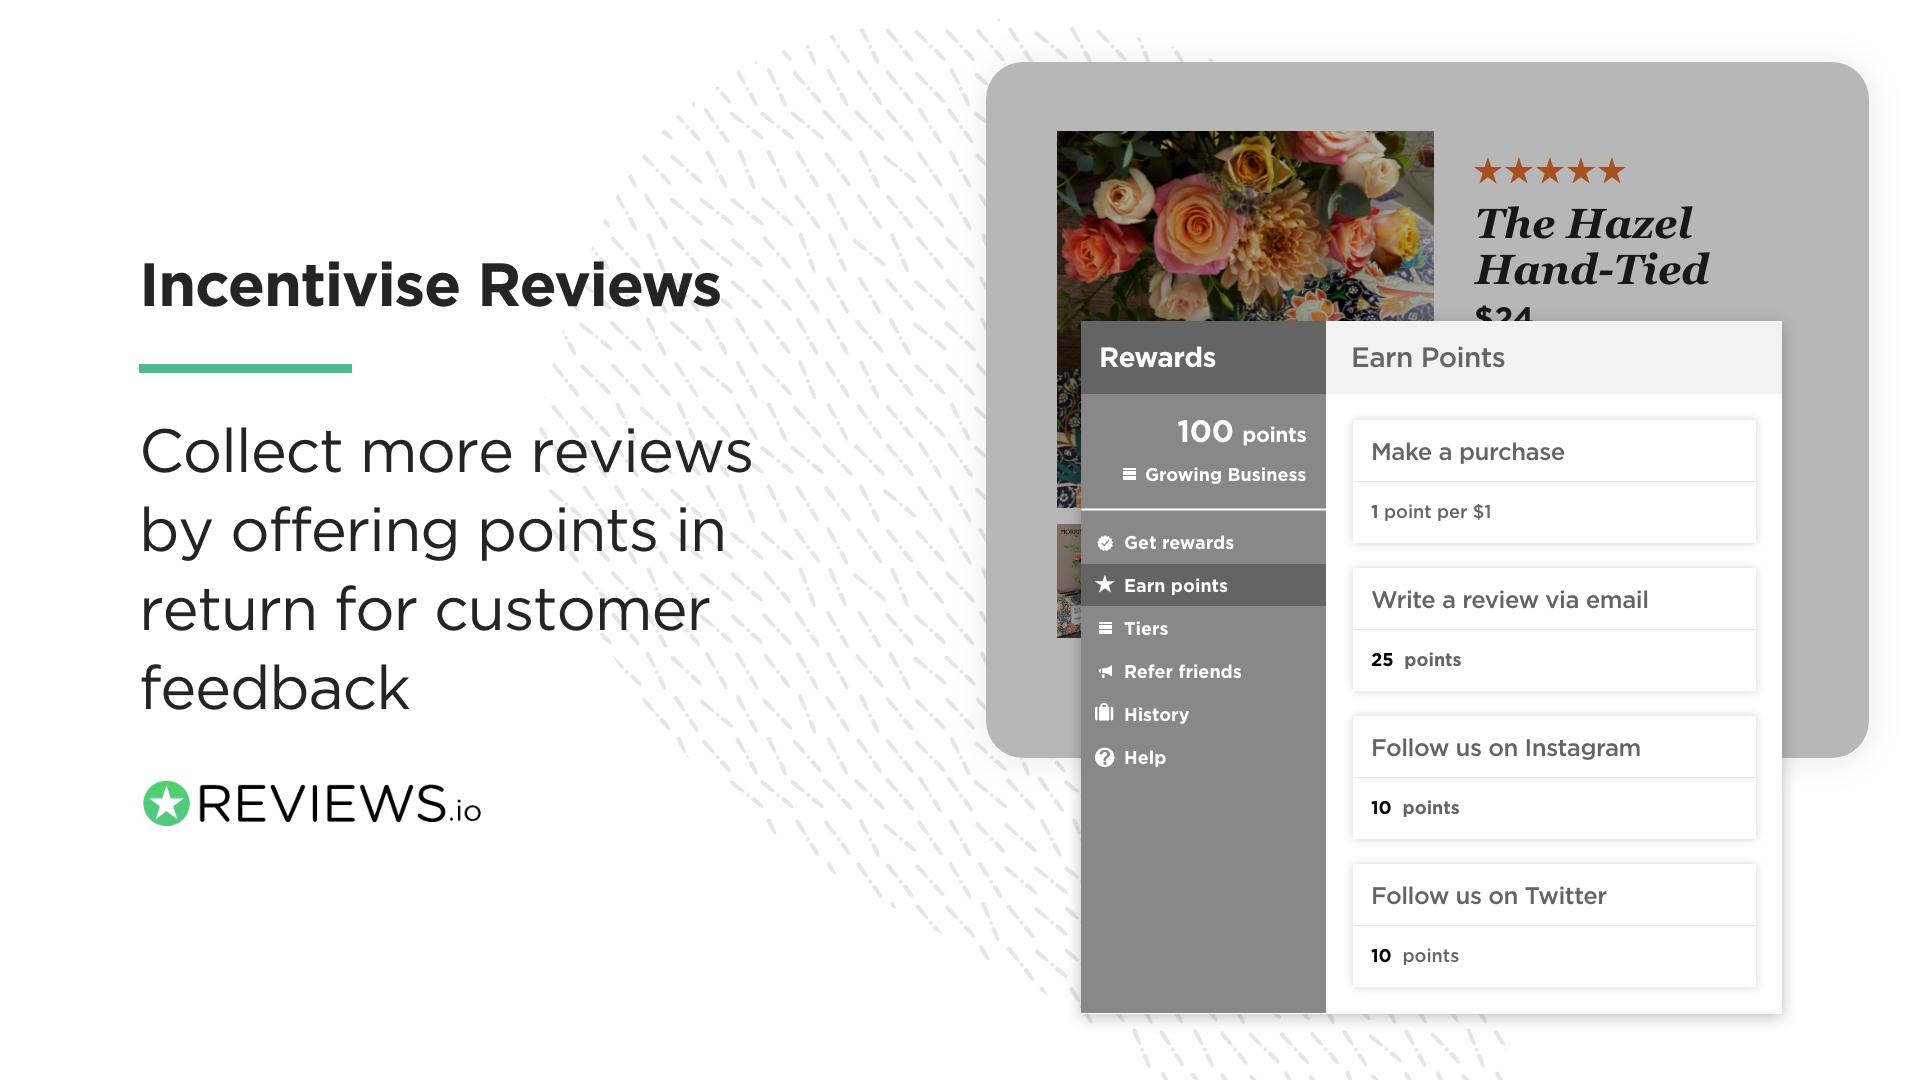 loyaltylion reviewsio rewards email